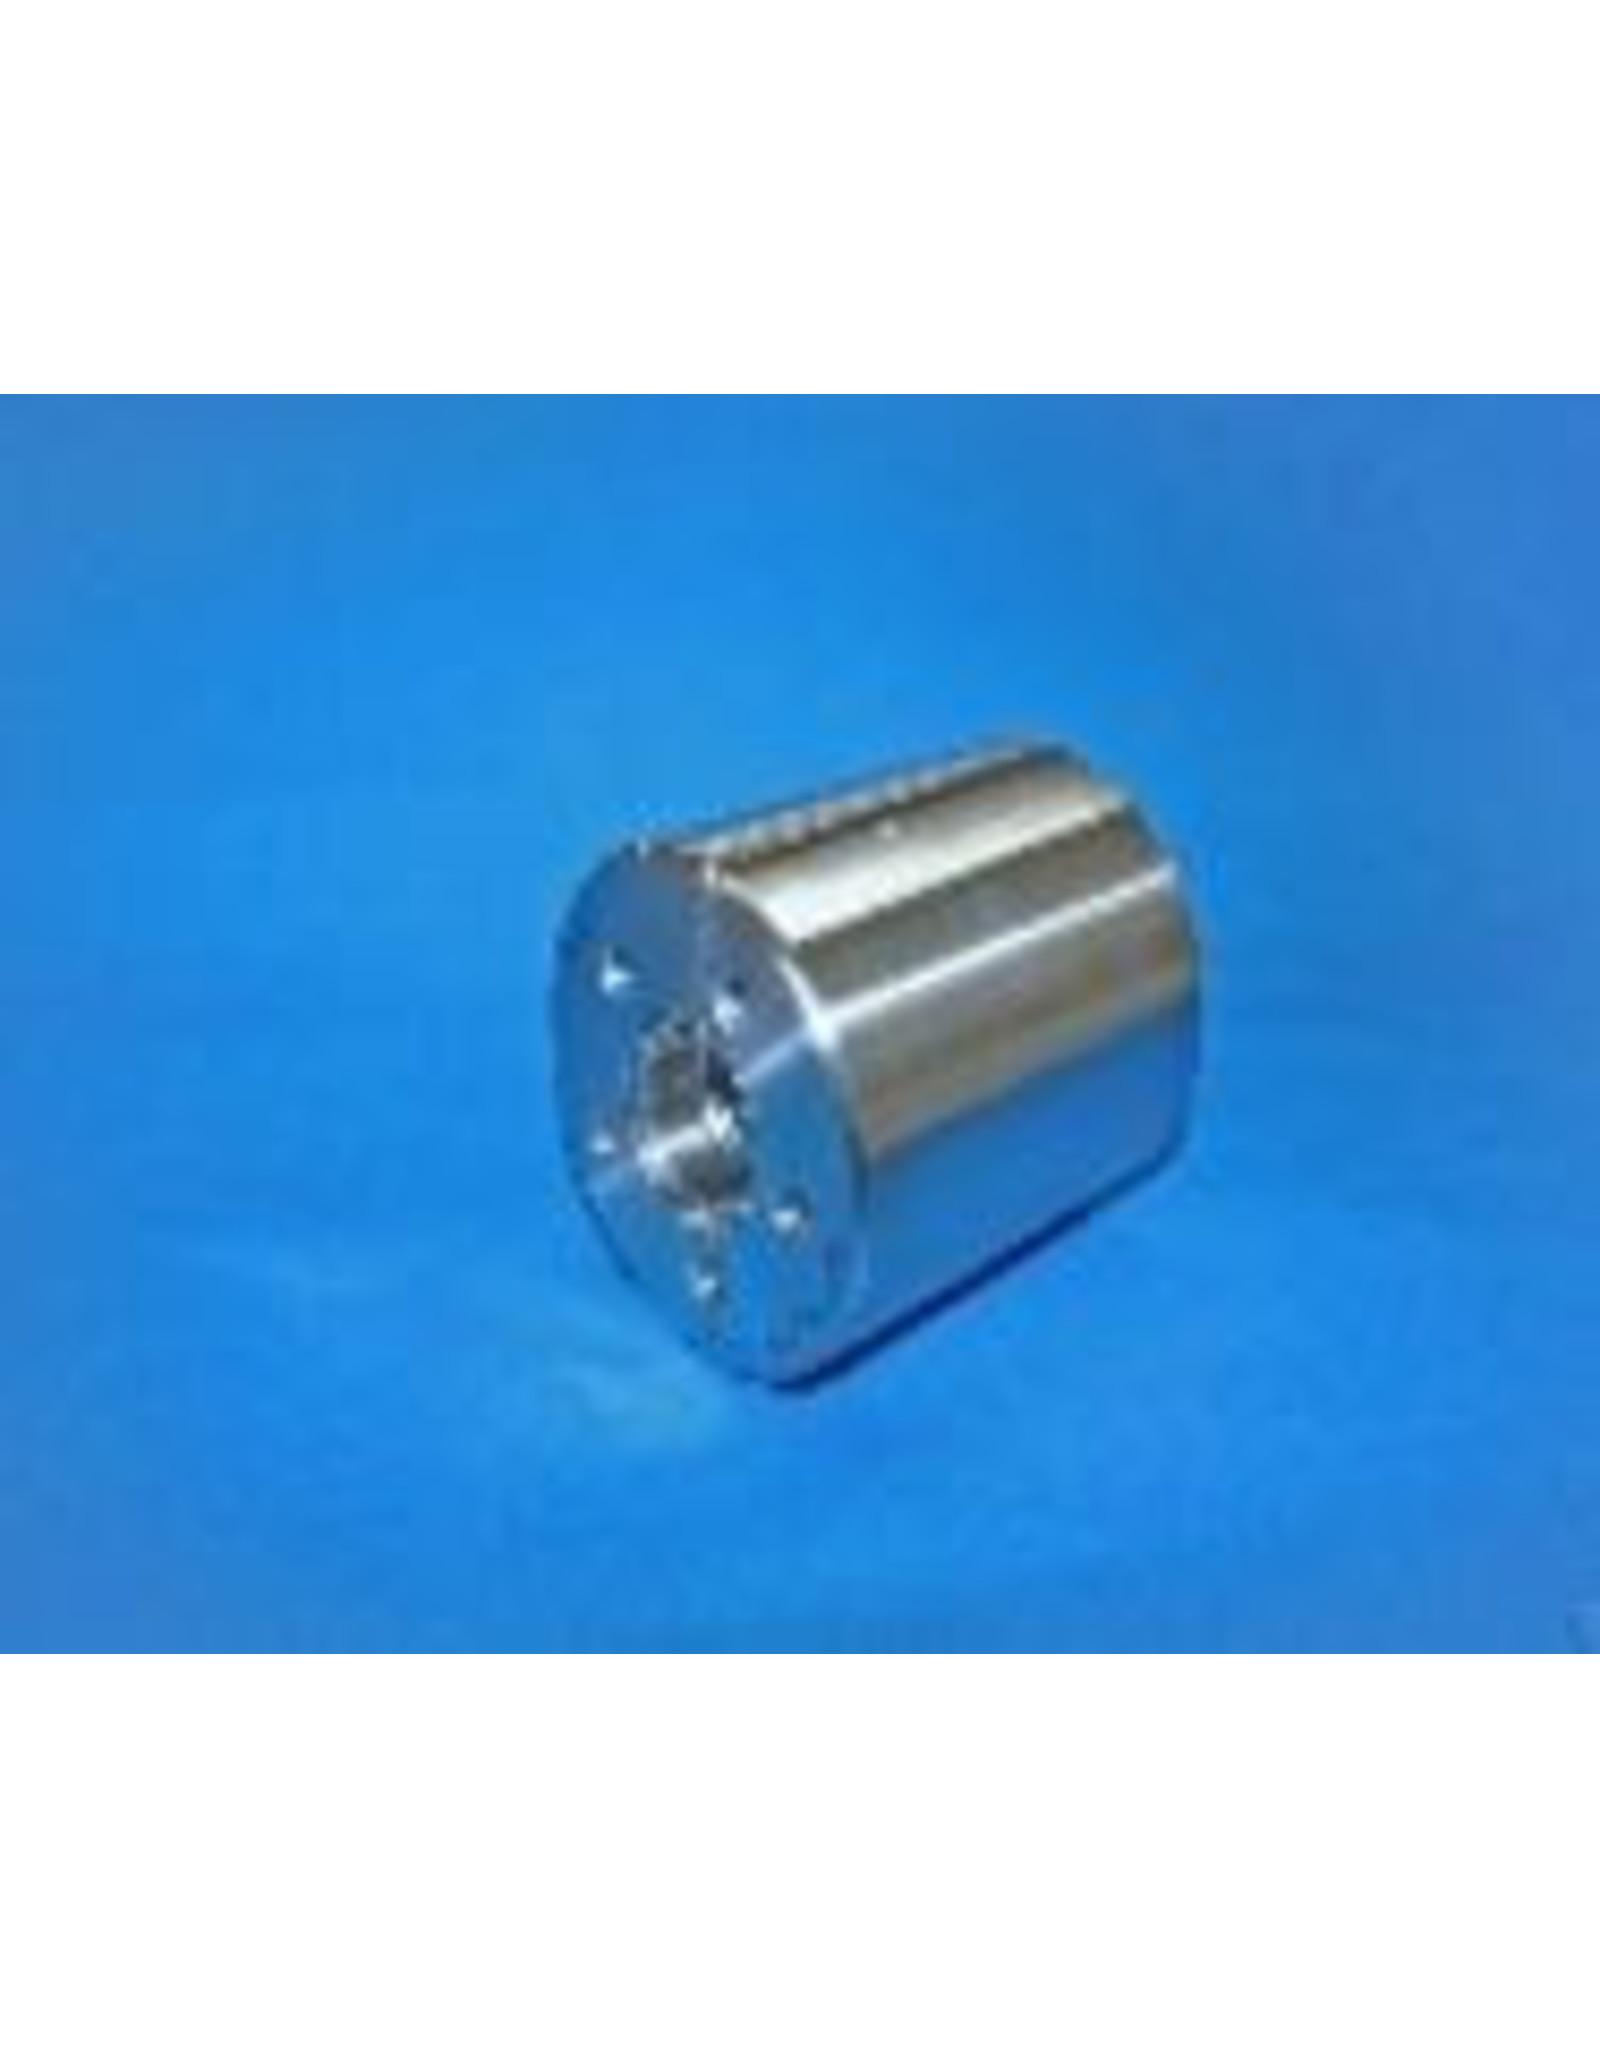 KMT Style Cylinder Nut, SL5 Classic